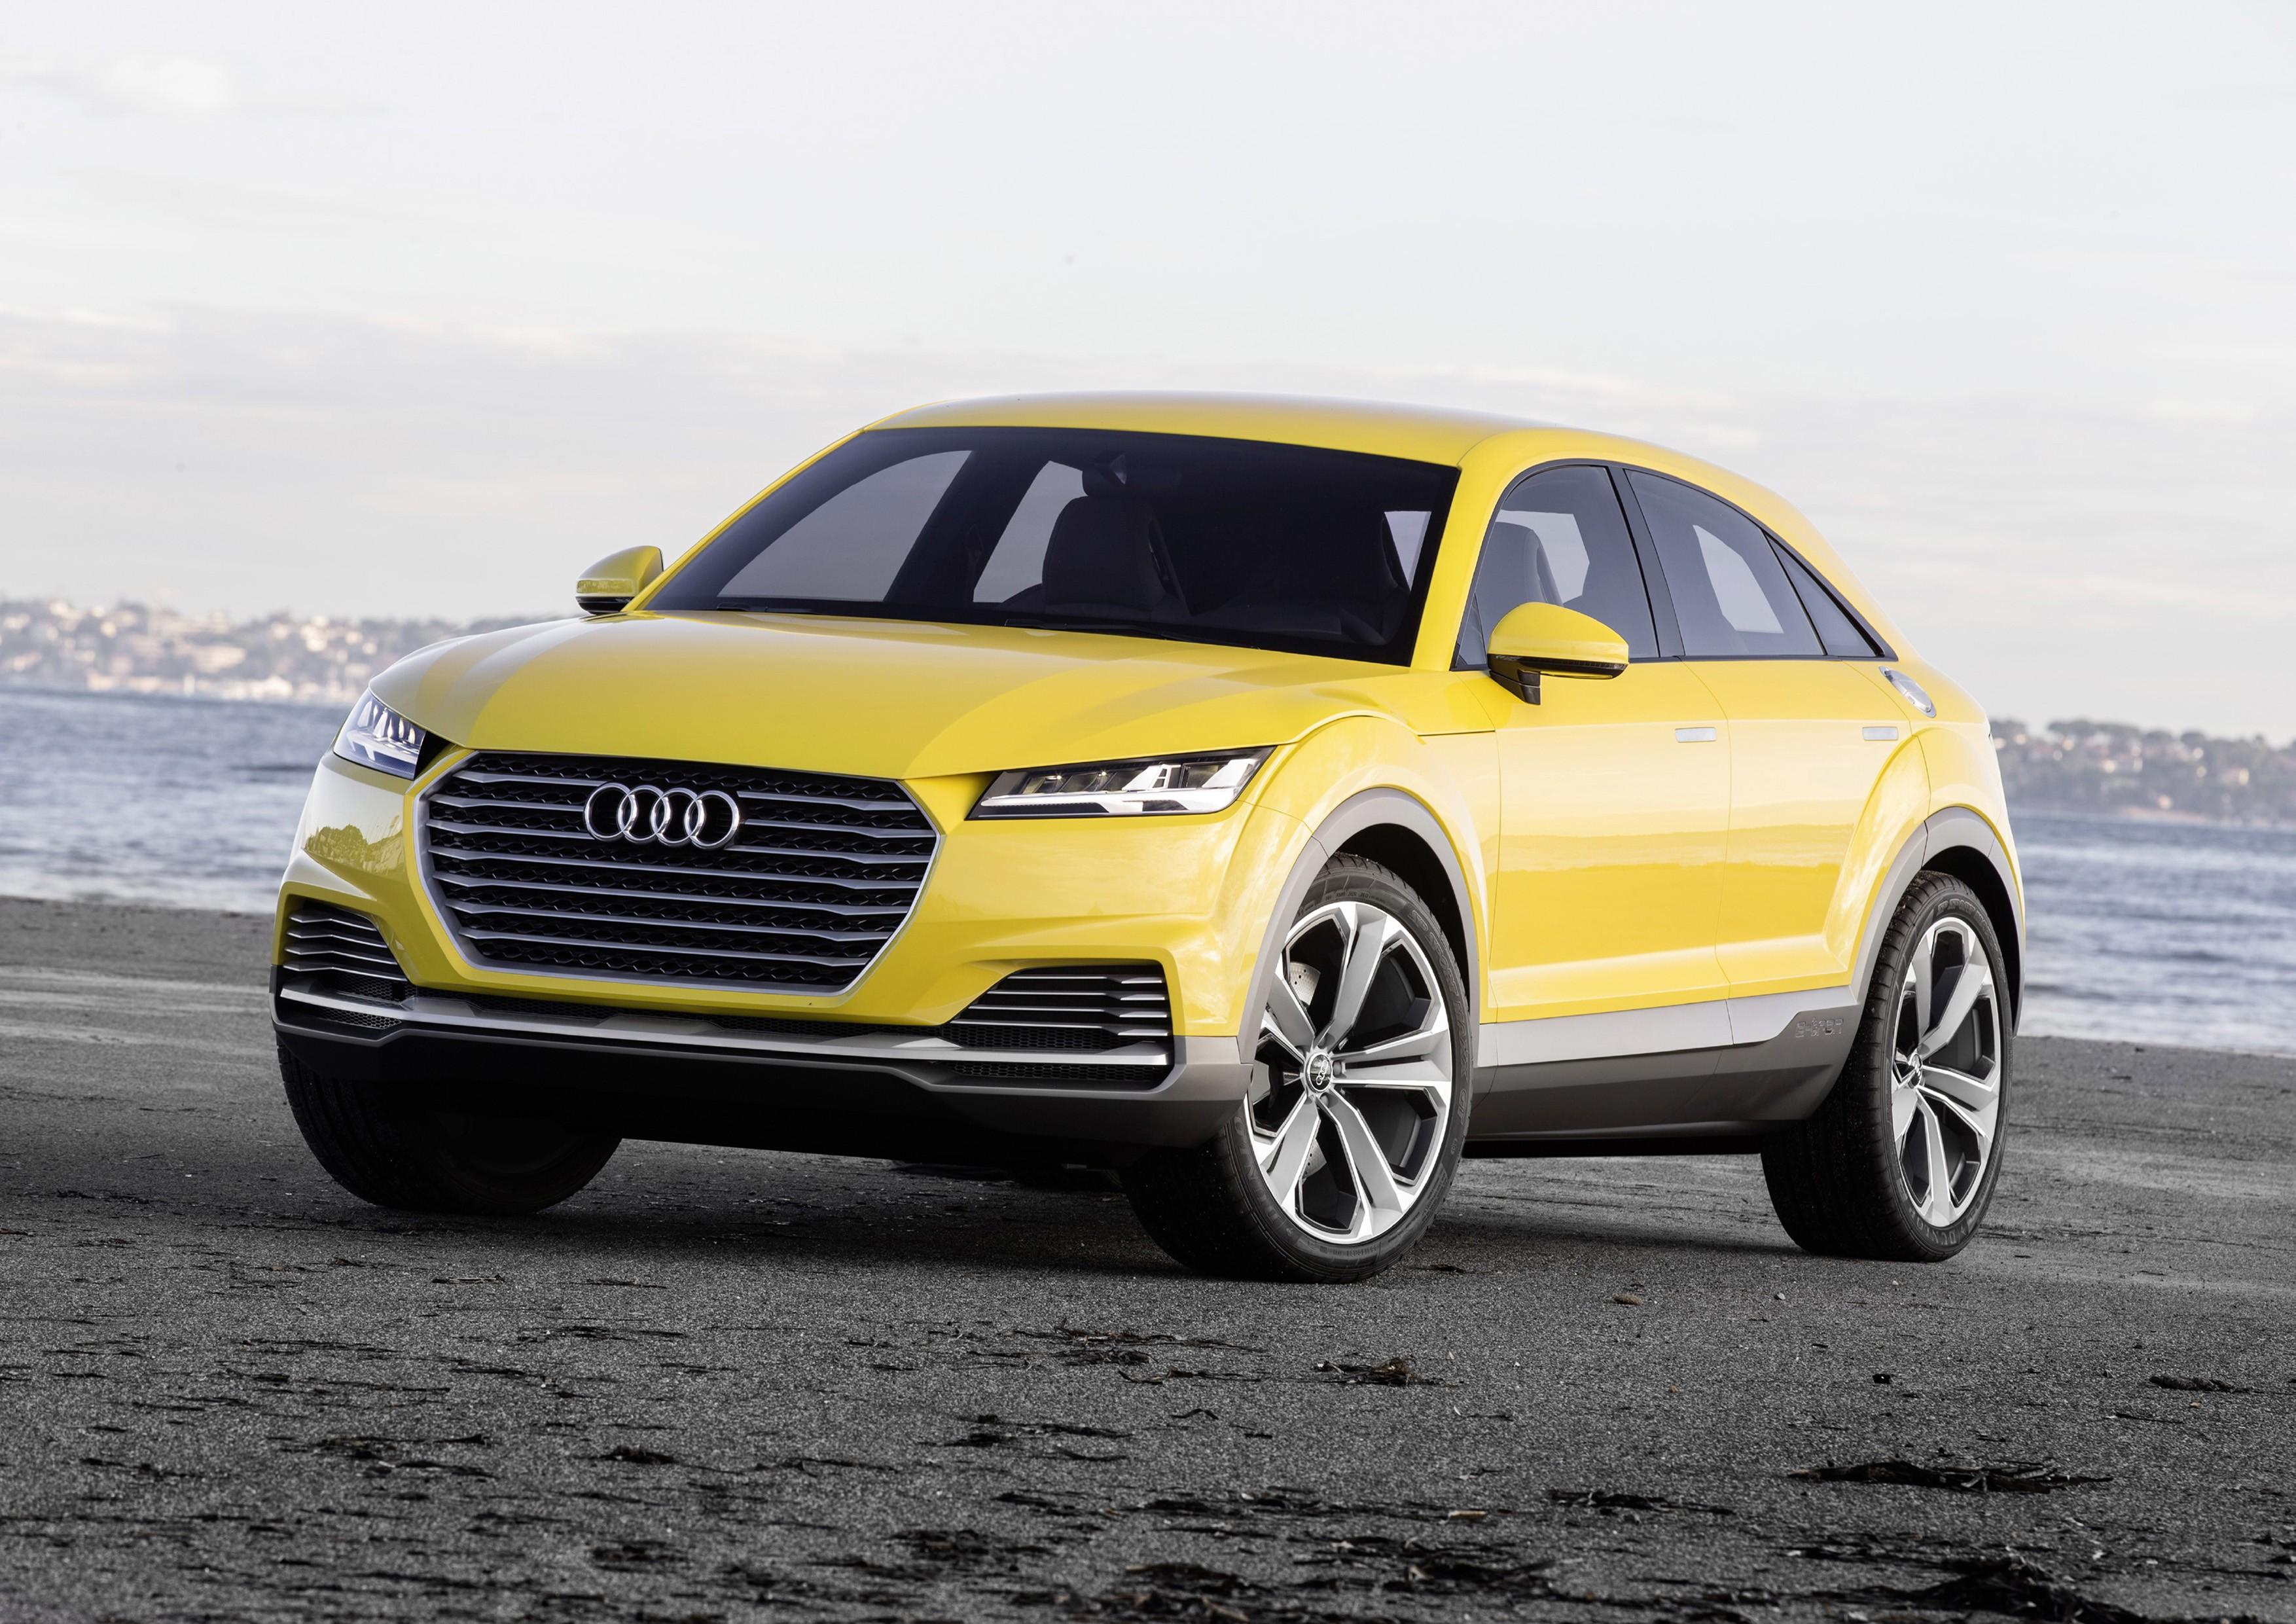 2017 Audi Ttq Rendered Autoevolution